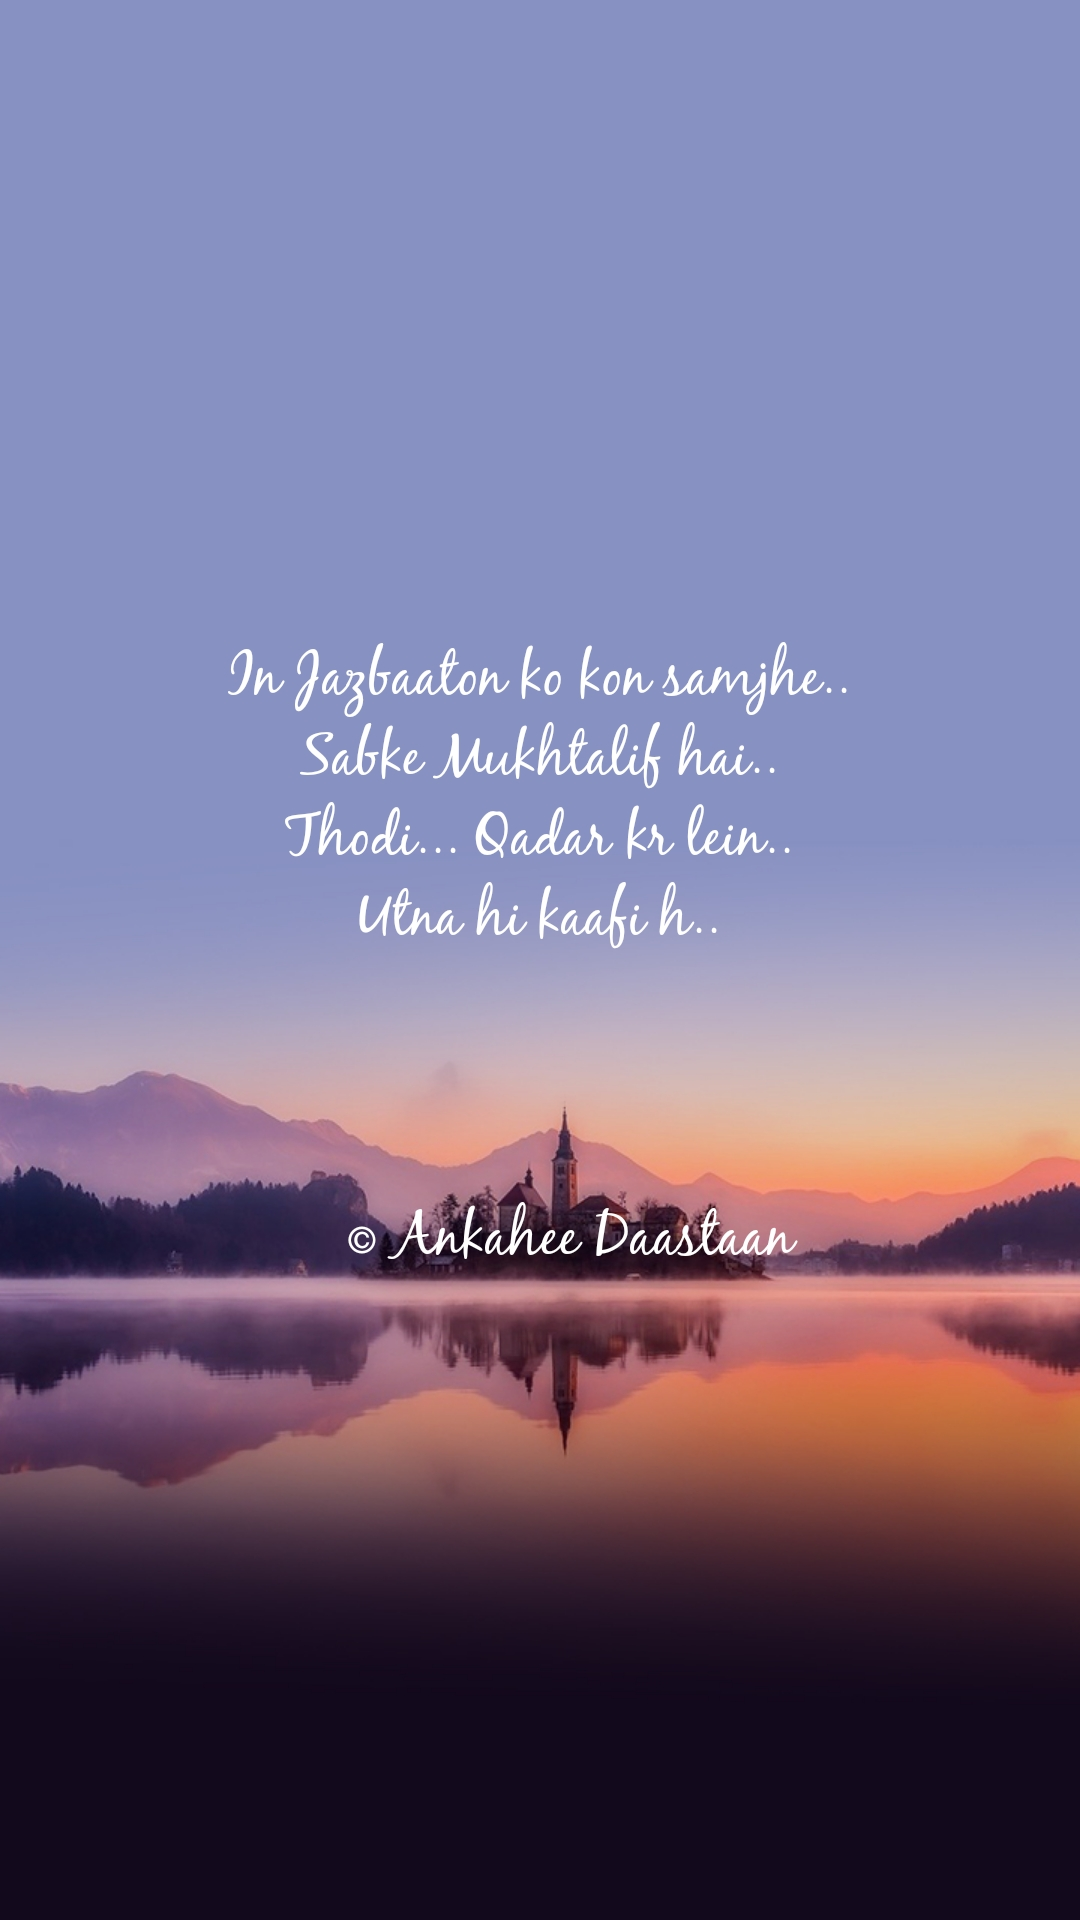 In Jazbaaton ko kon samjhe.. Sabke Mukhtalif hai.. Thodi... Qadar kr lein.. Utna hi kaafi h..        © Ankahee Daastaan